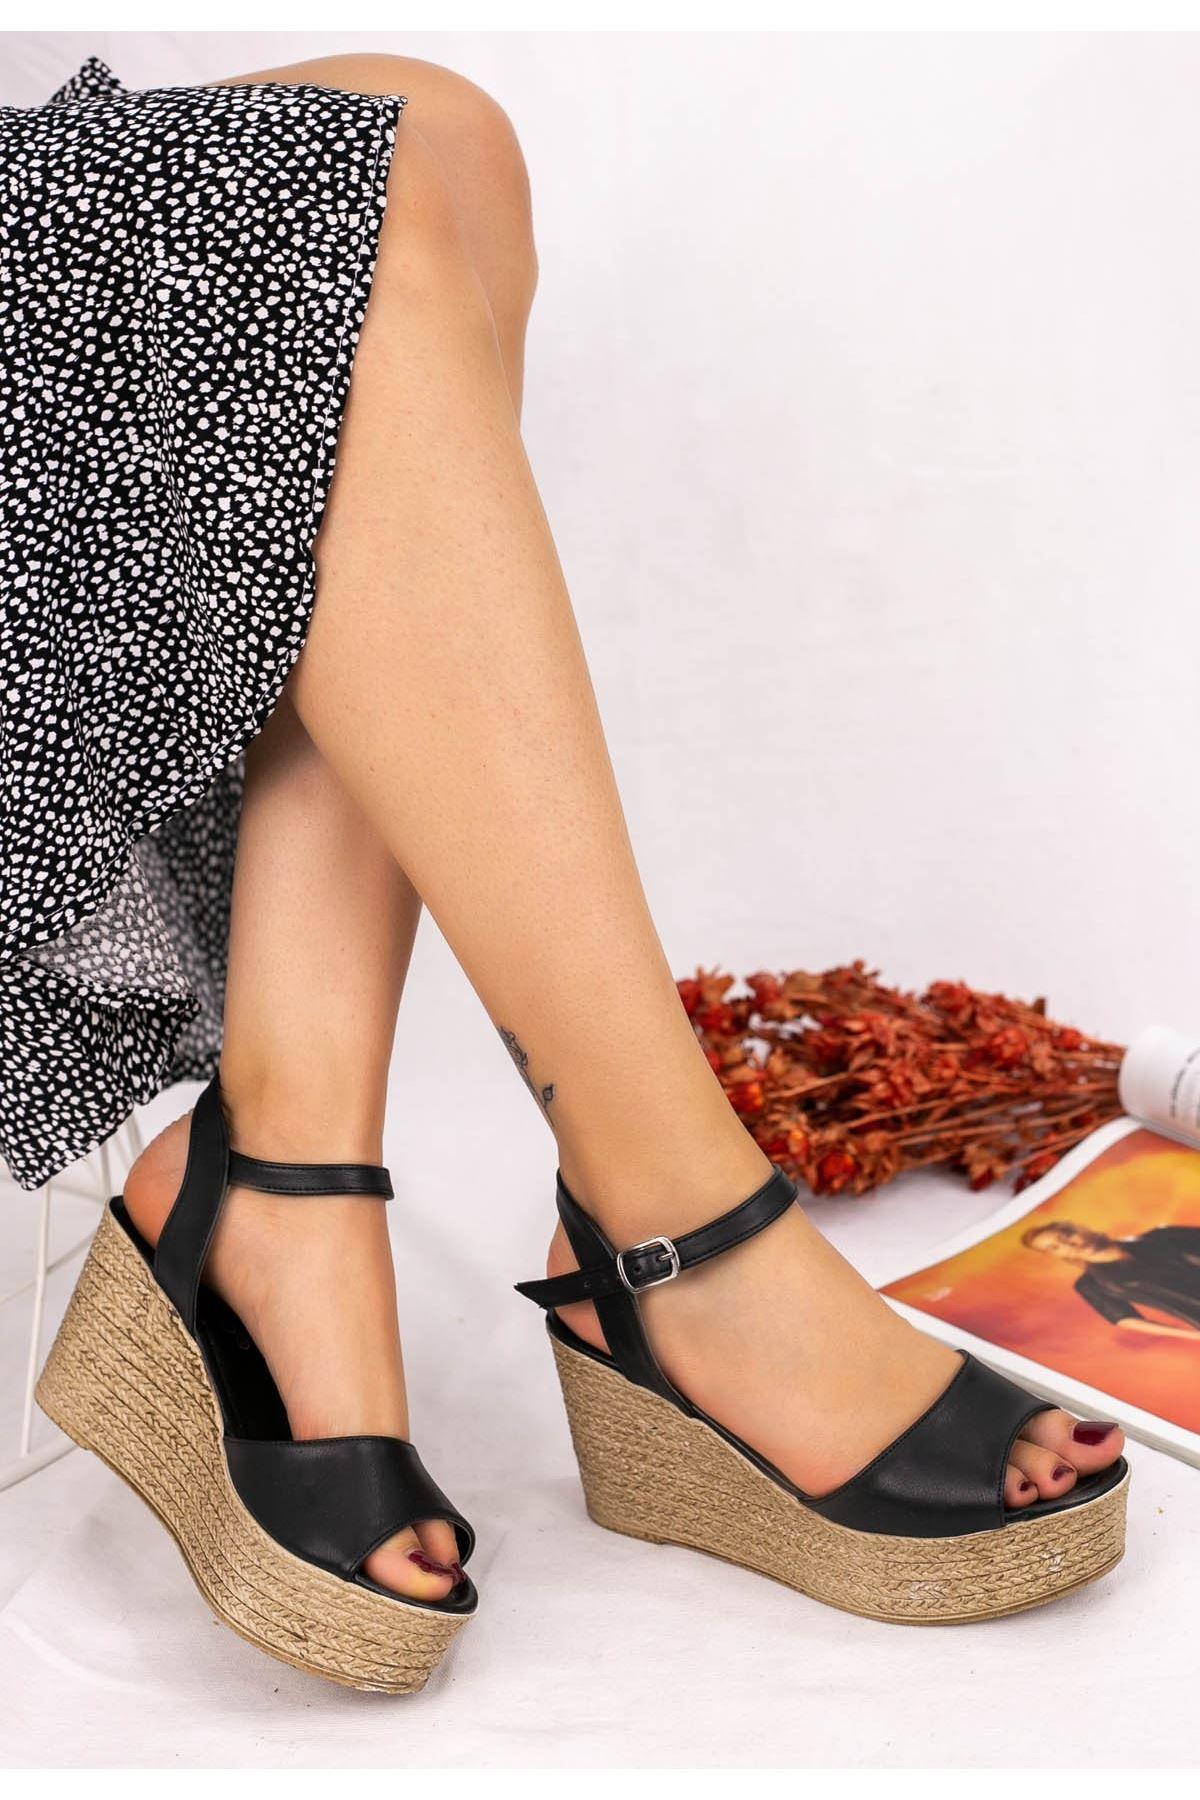 Olivie Siyah Cilt Dolgu Topuk Sandalet